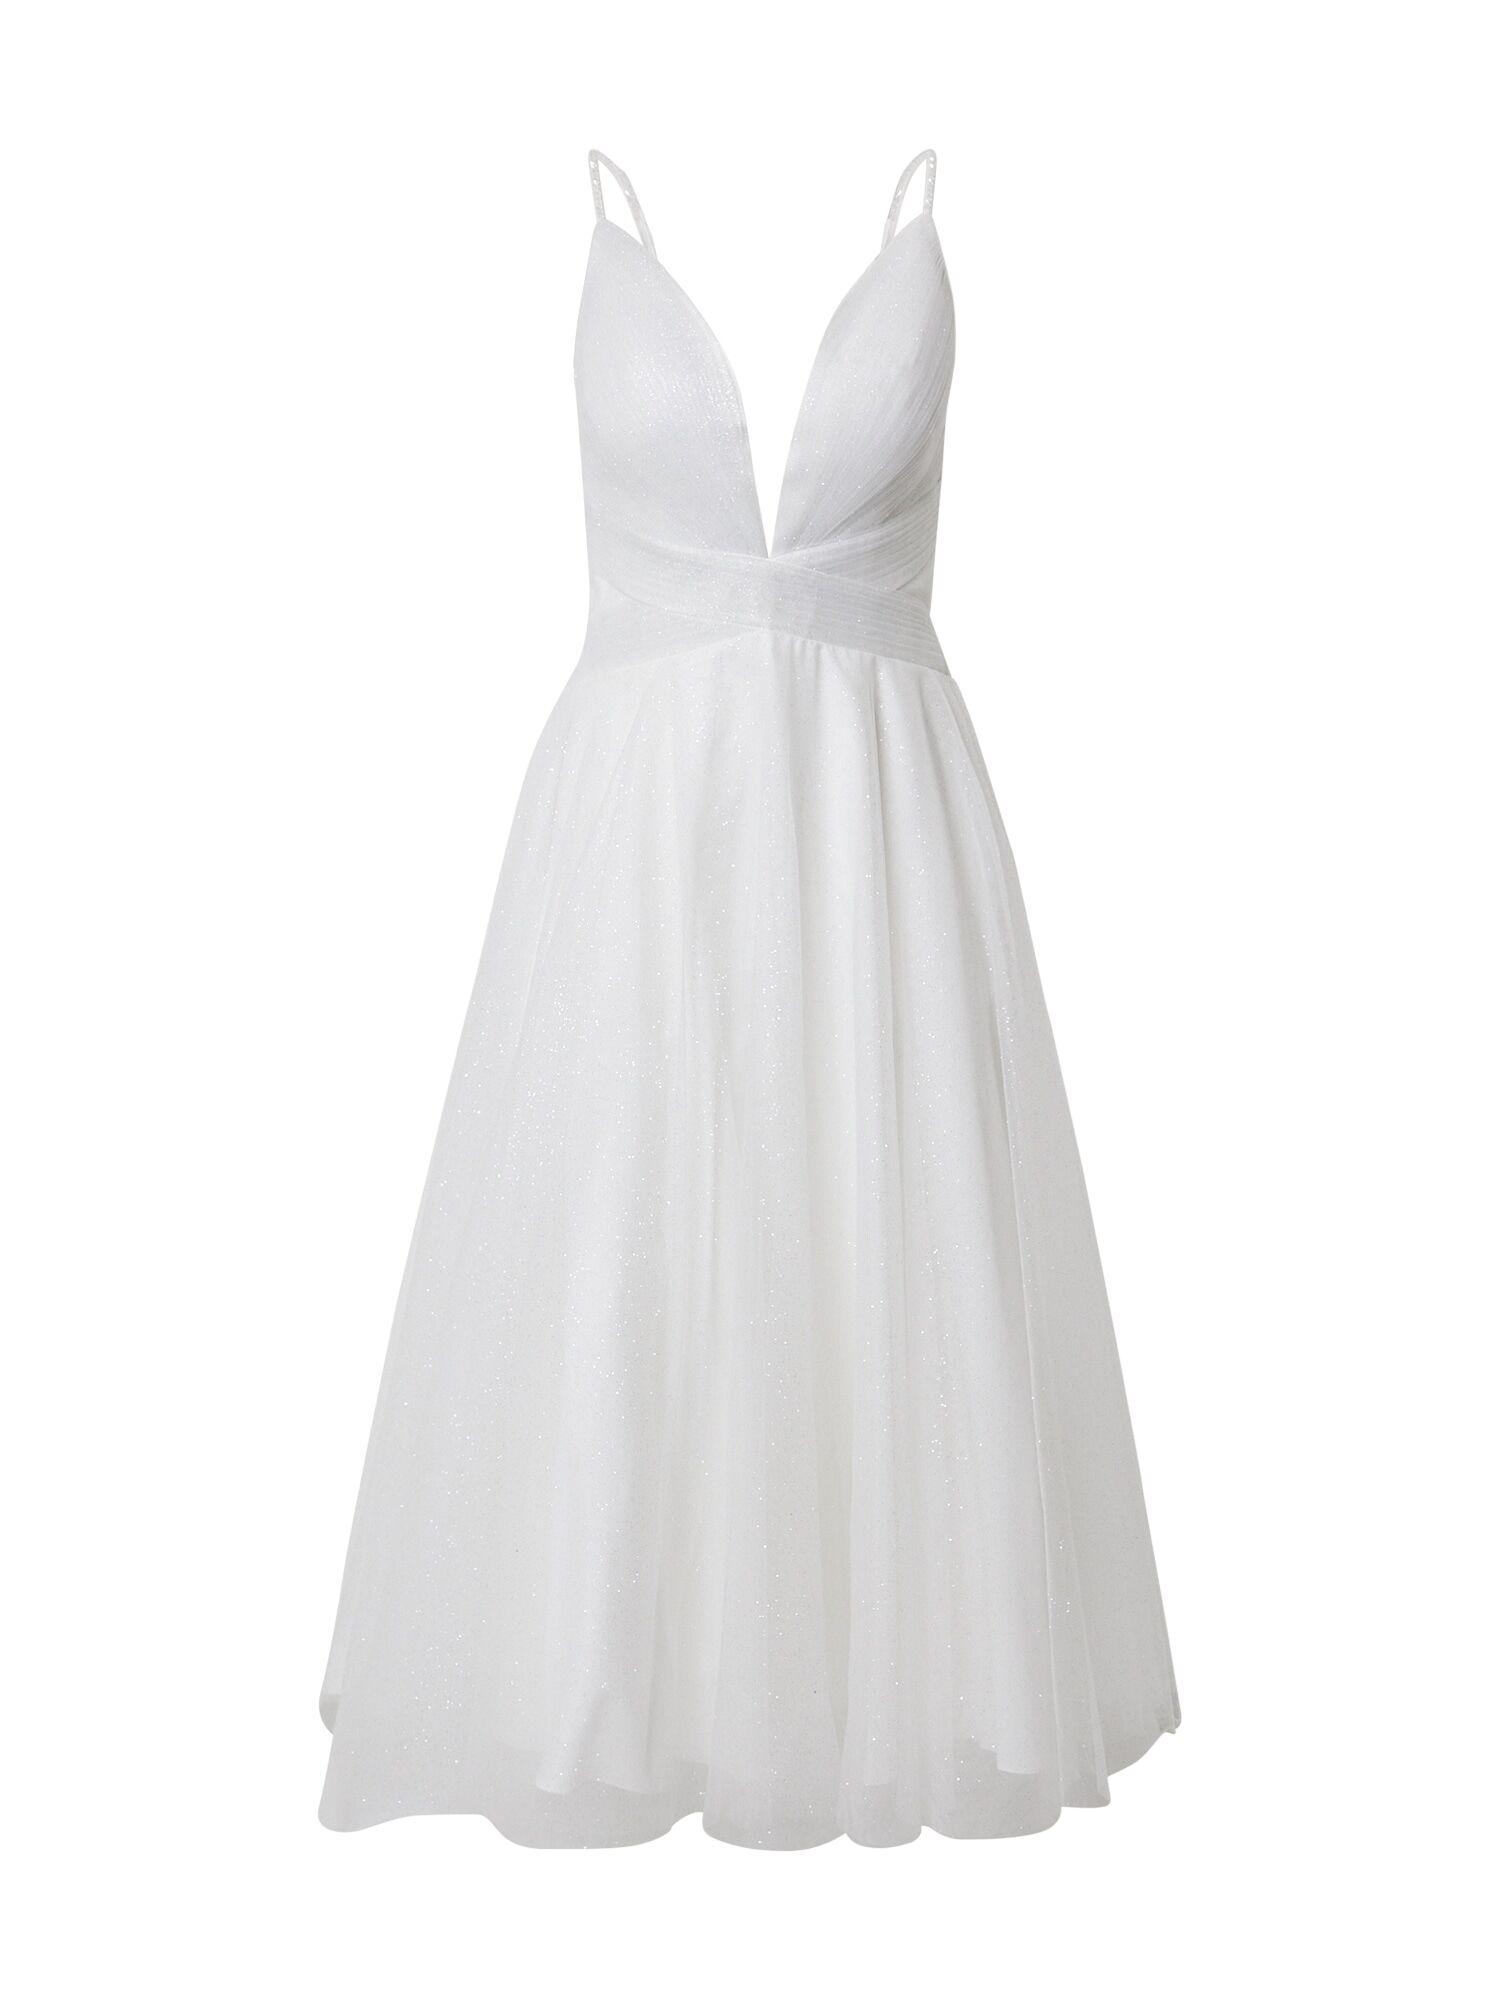 mascara Robe de soirée  - Blanc - Taille: 36 - female